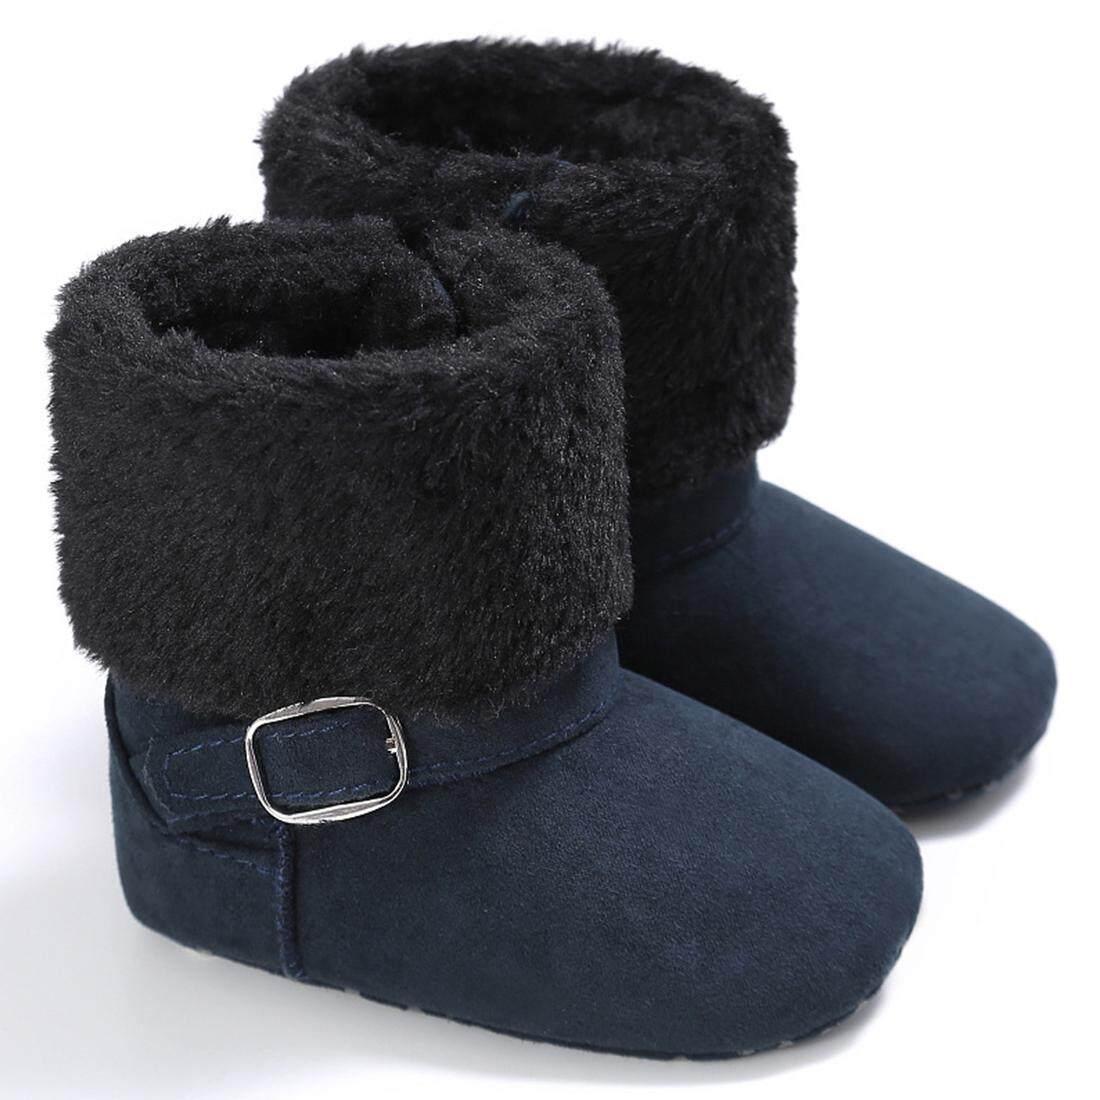 5a38a711945 Newborn Toddler Baby Boy Girl Warm Soft Sole Snow Boots Crib Shoes 0 -18Months